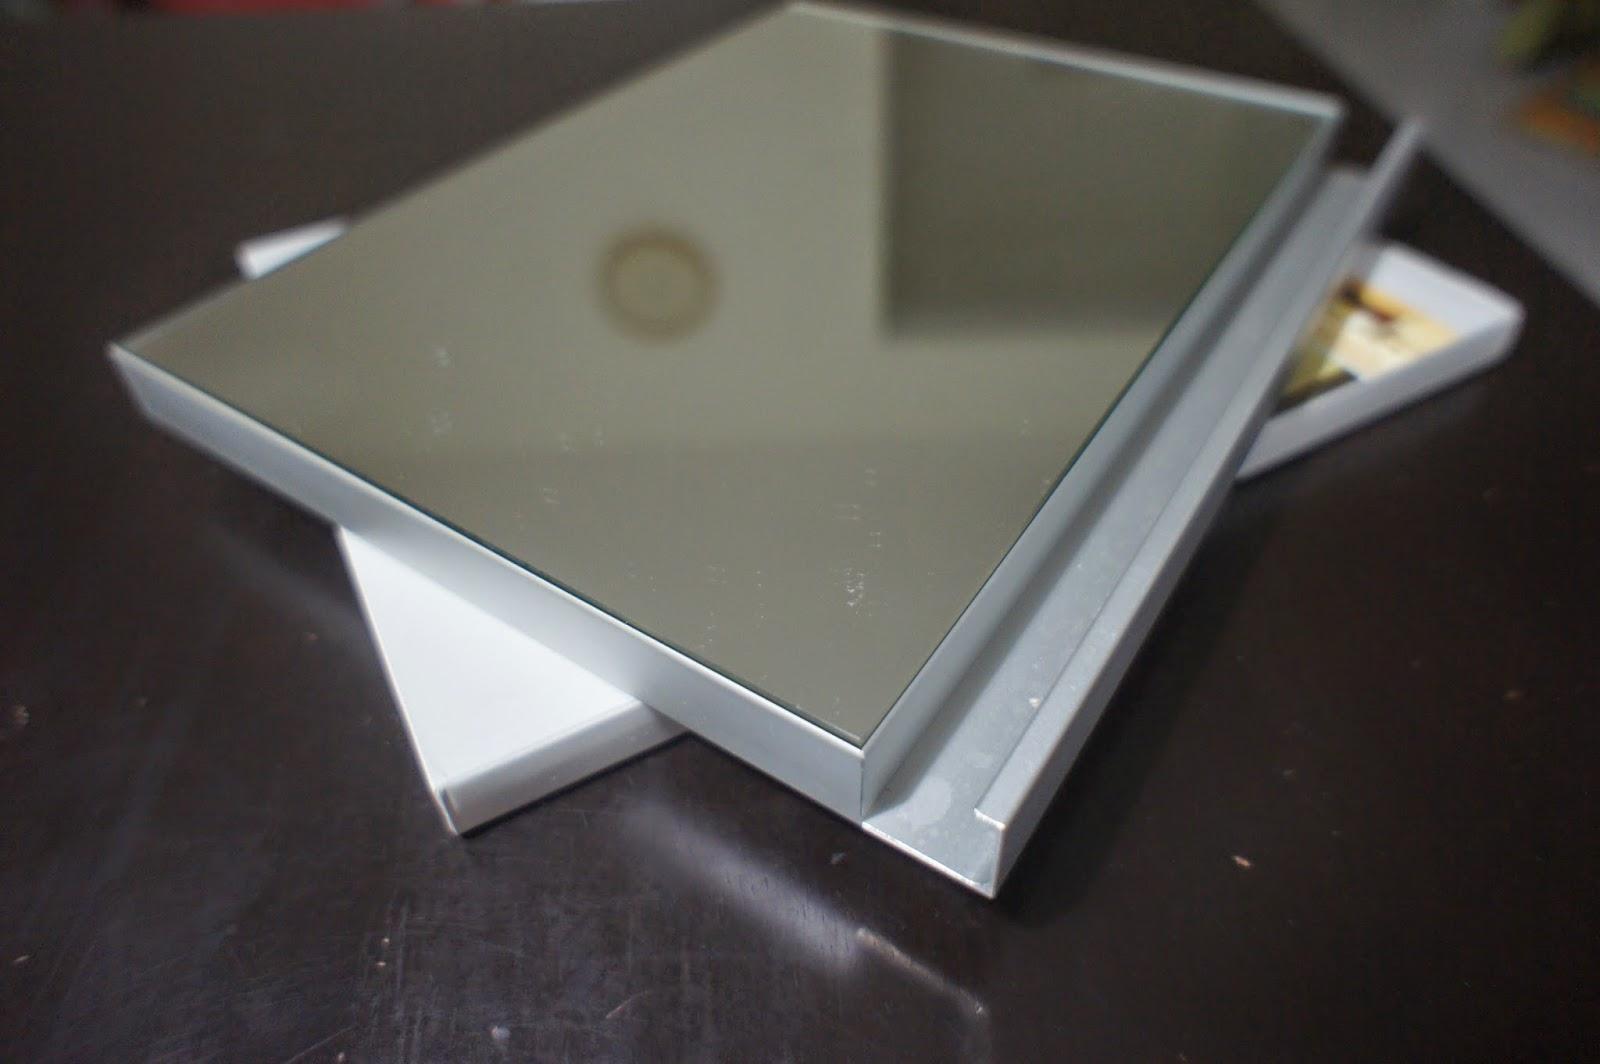 fukusu Kitchen Cabinet Materials : DSC08144 from fukusu.blogspot.com size 1600 x 1064 jpeg 109kB